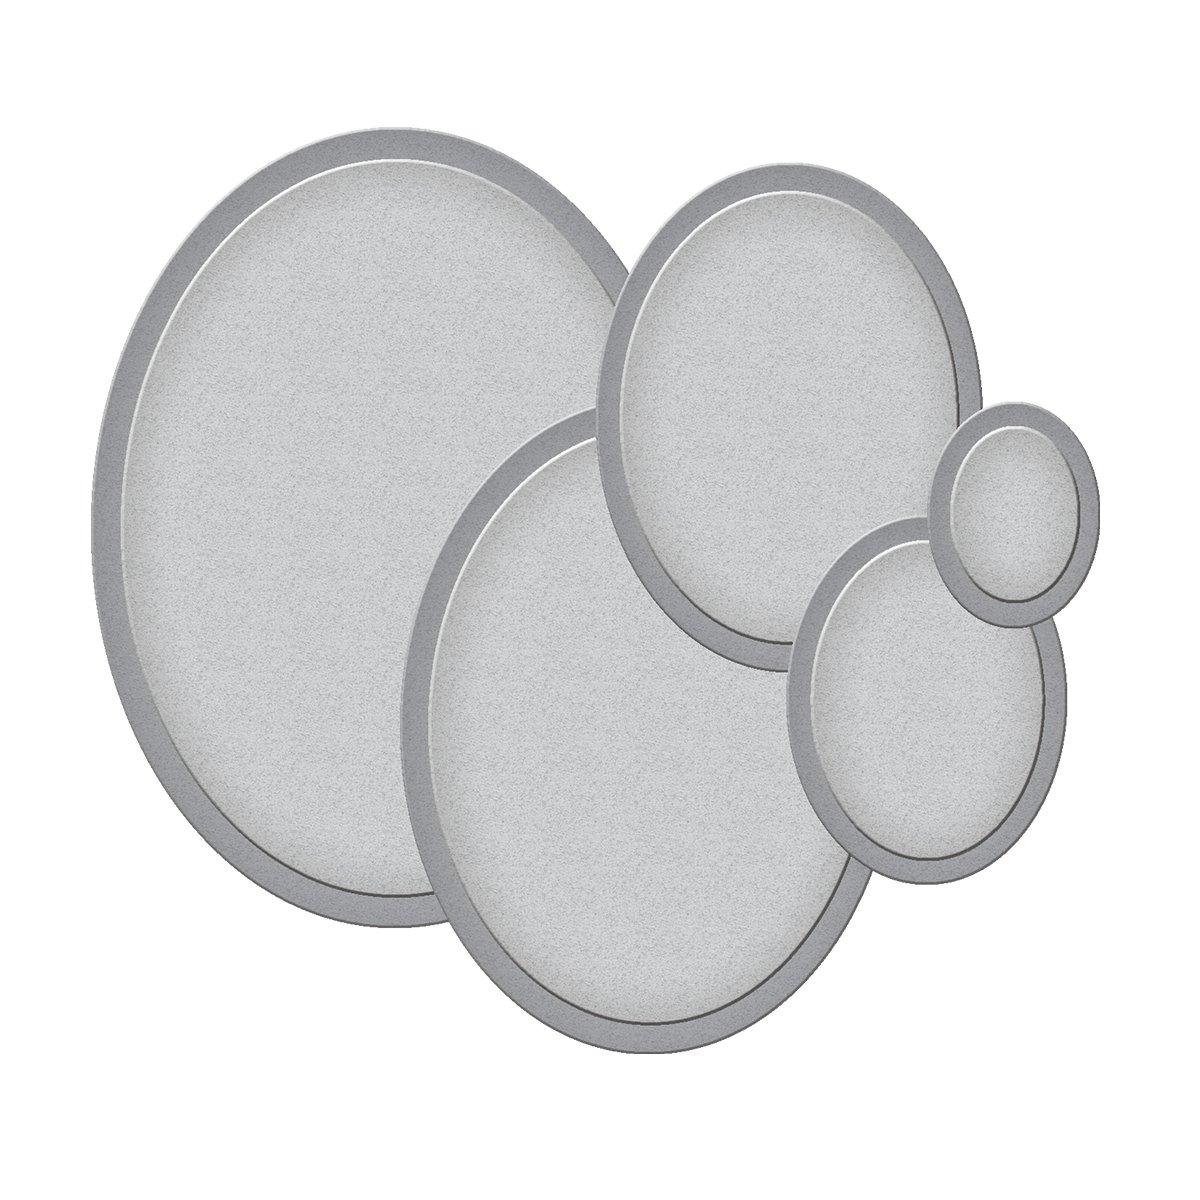 Amazon.com: Spellbinders S4-110 Nestabilities Large Classic Ovals ...